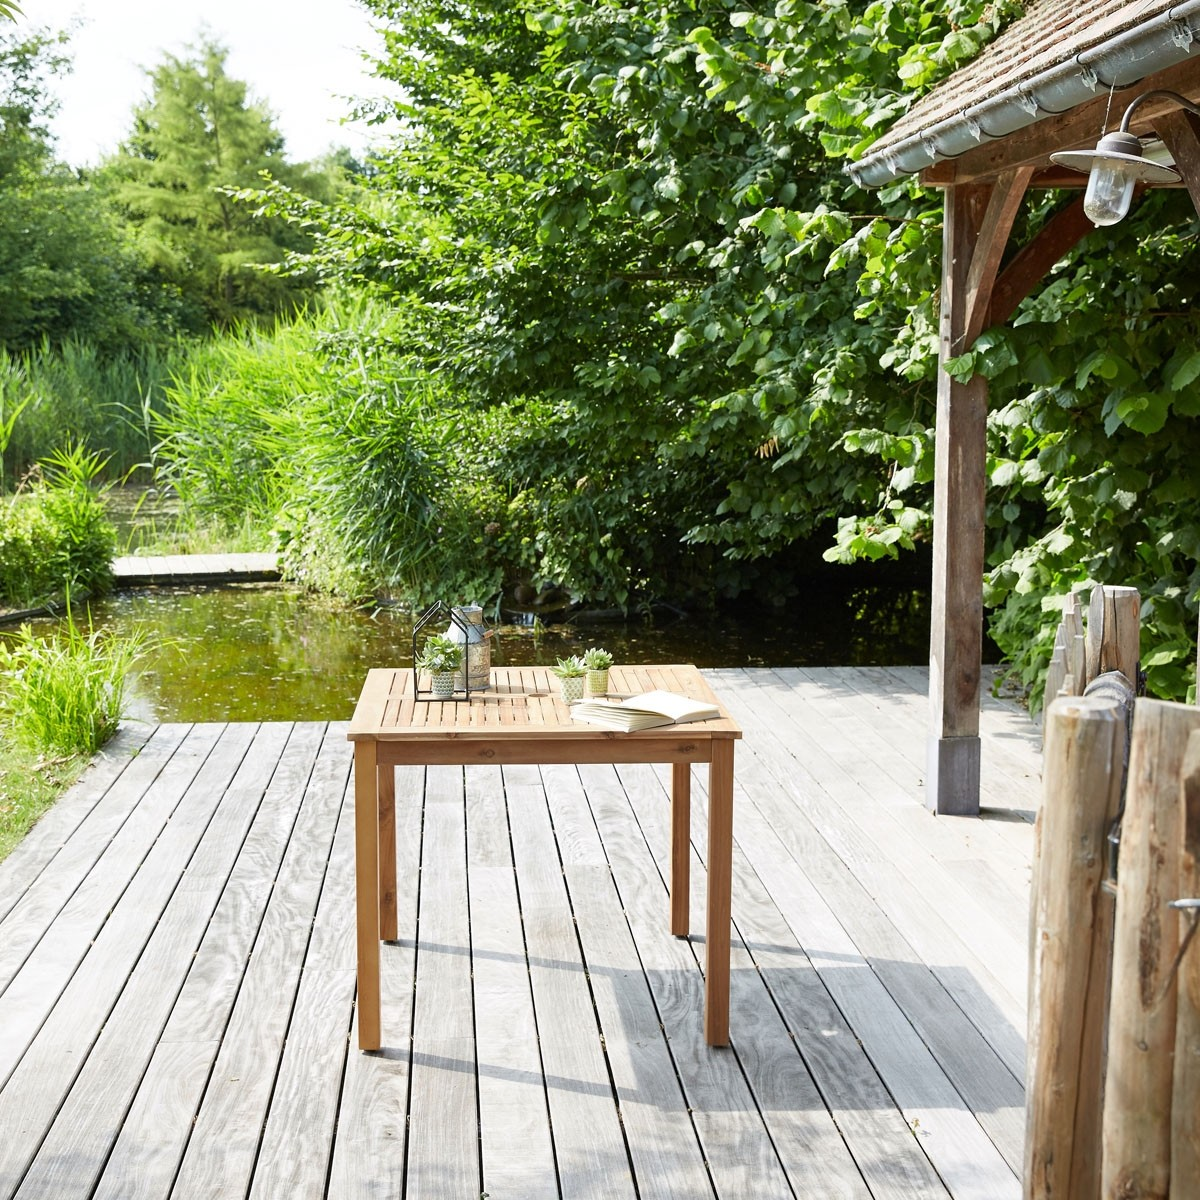 Salon de jardin en bois d 39 acacia 4 places fsc bois dessus bois dessous - Huile pour salon de jardin acacia ...